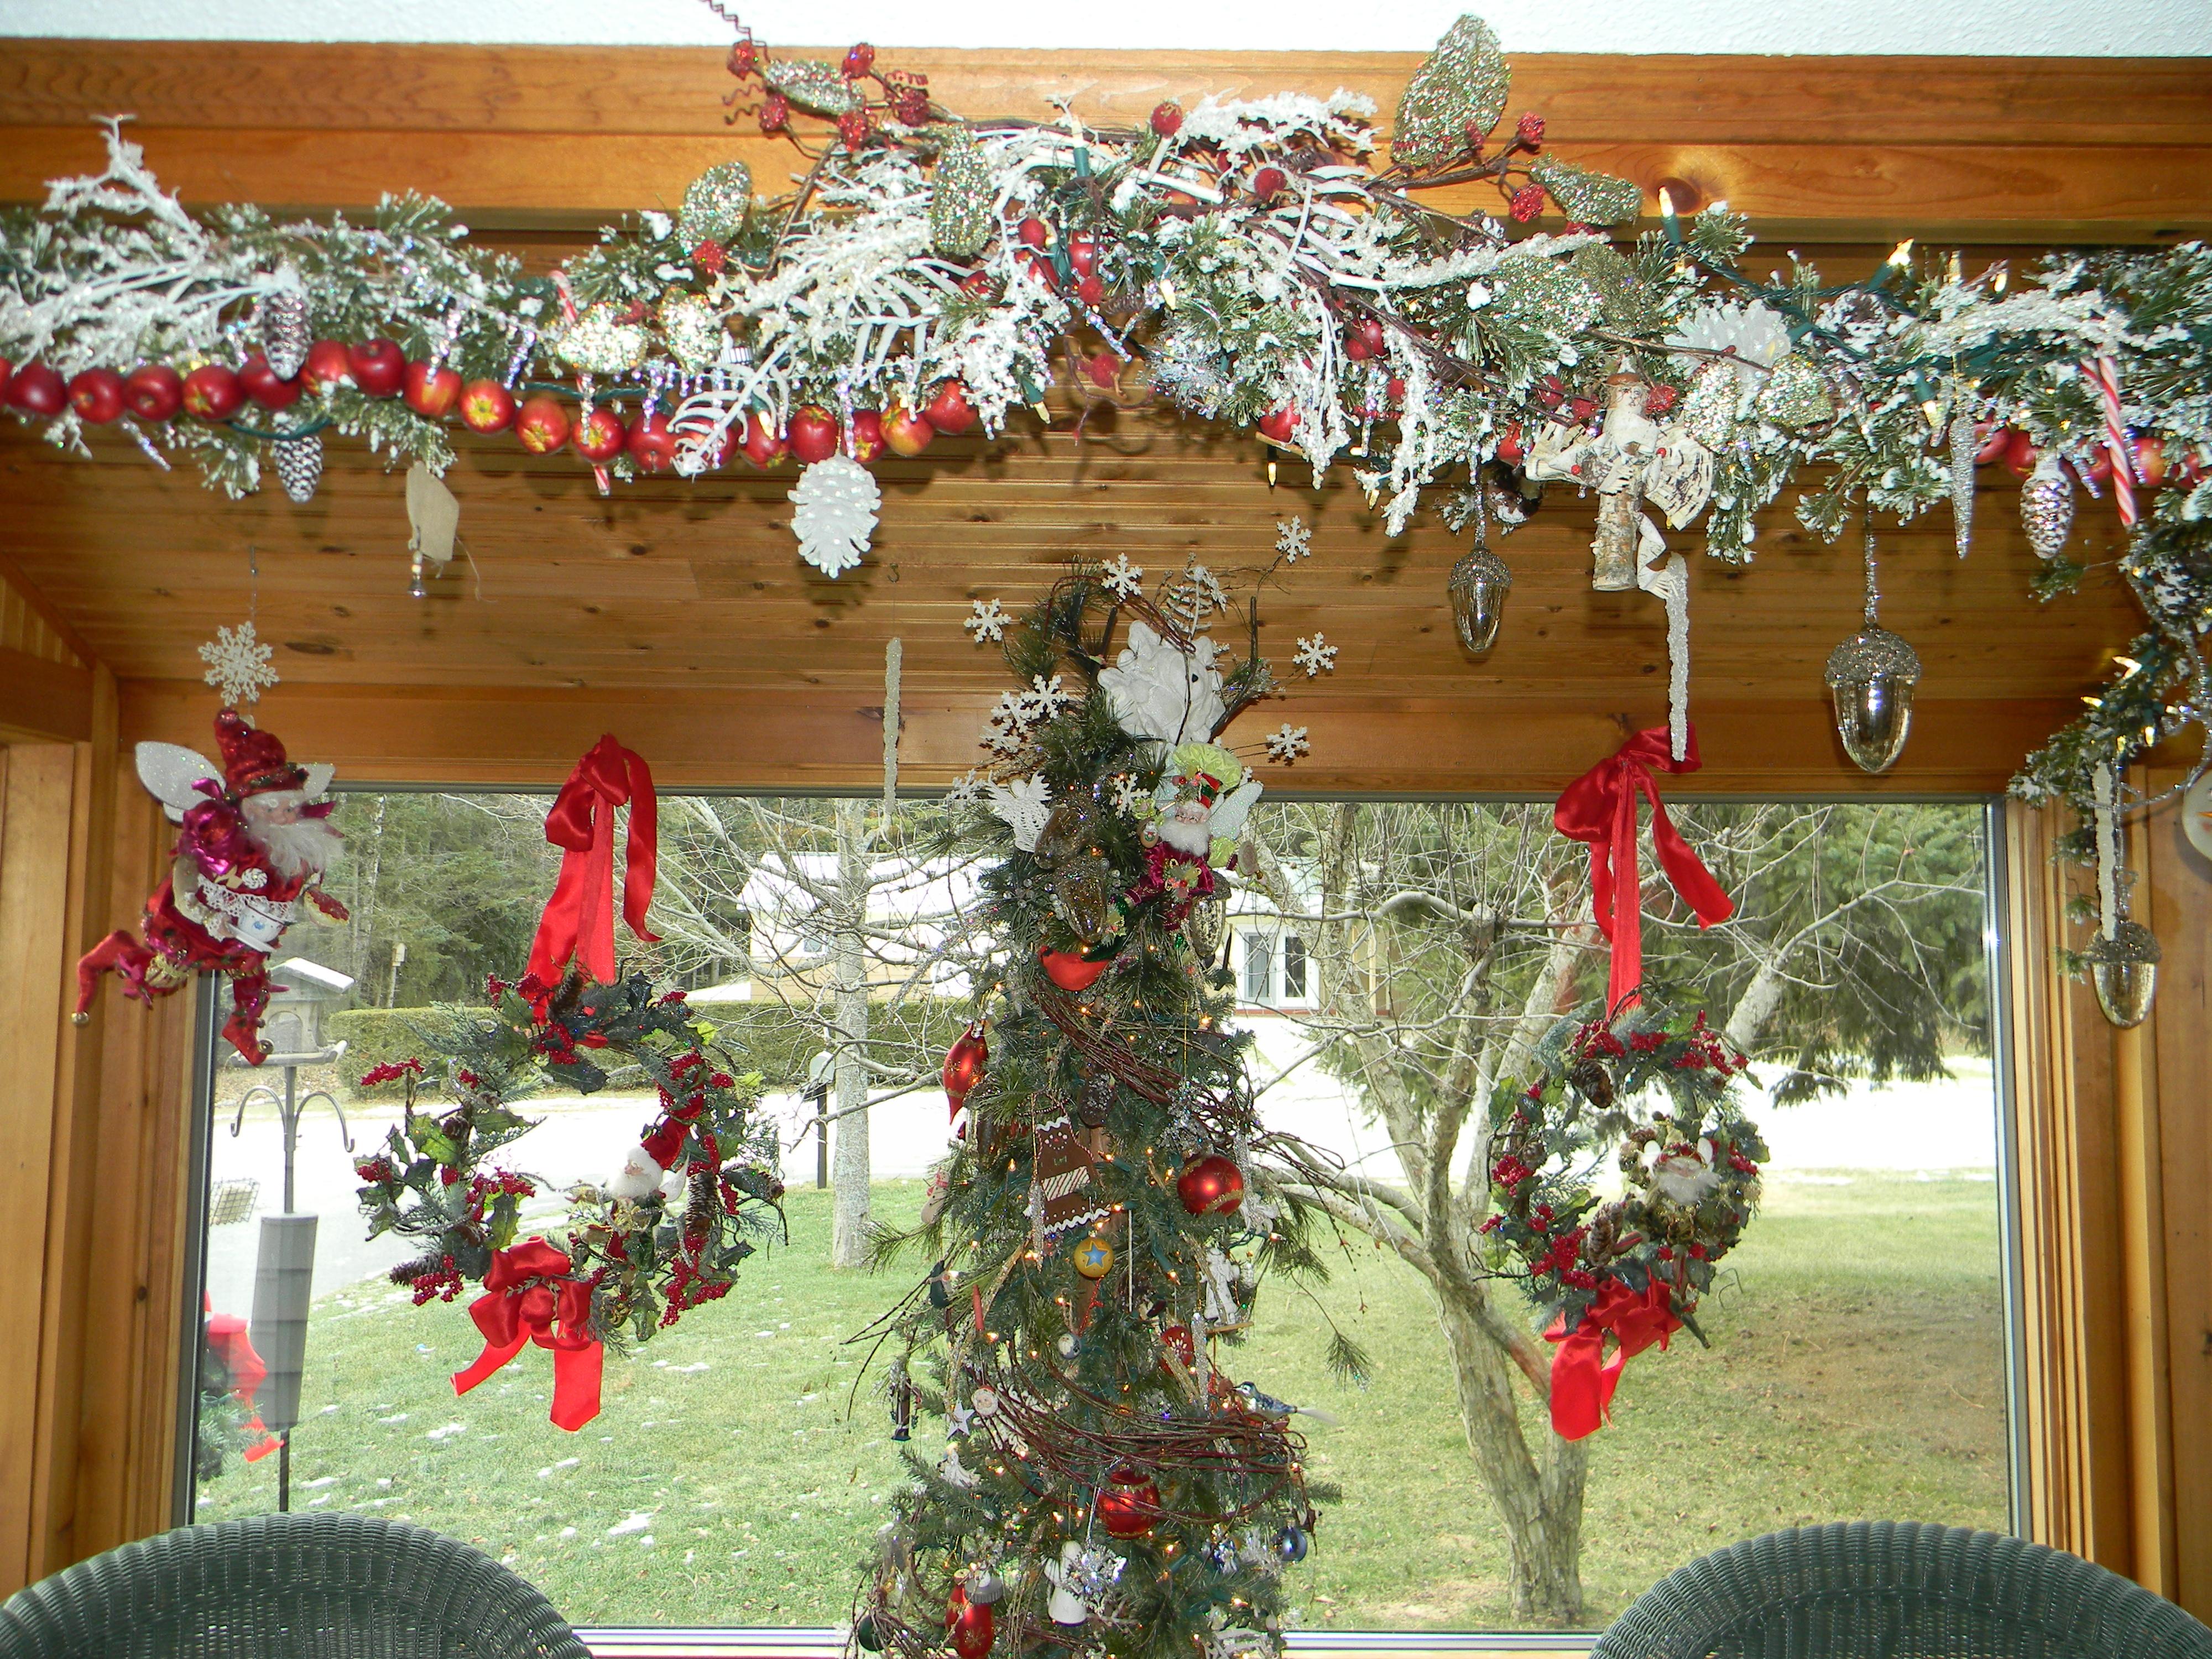 icy winter wonderland decorations christmas tree and chandelier joyful daisy